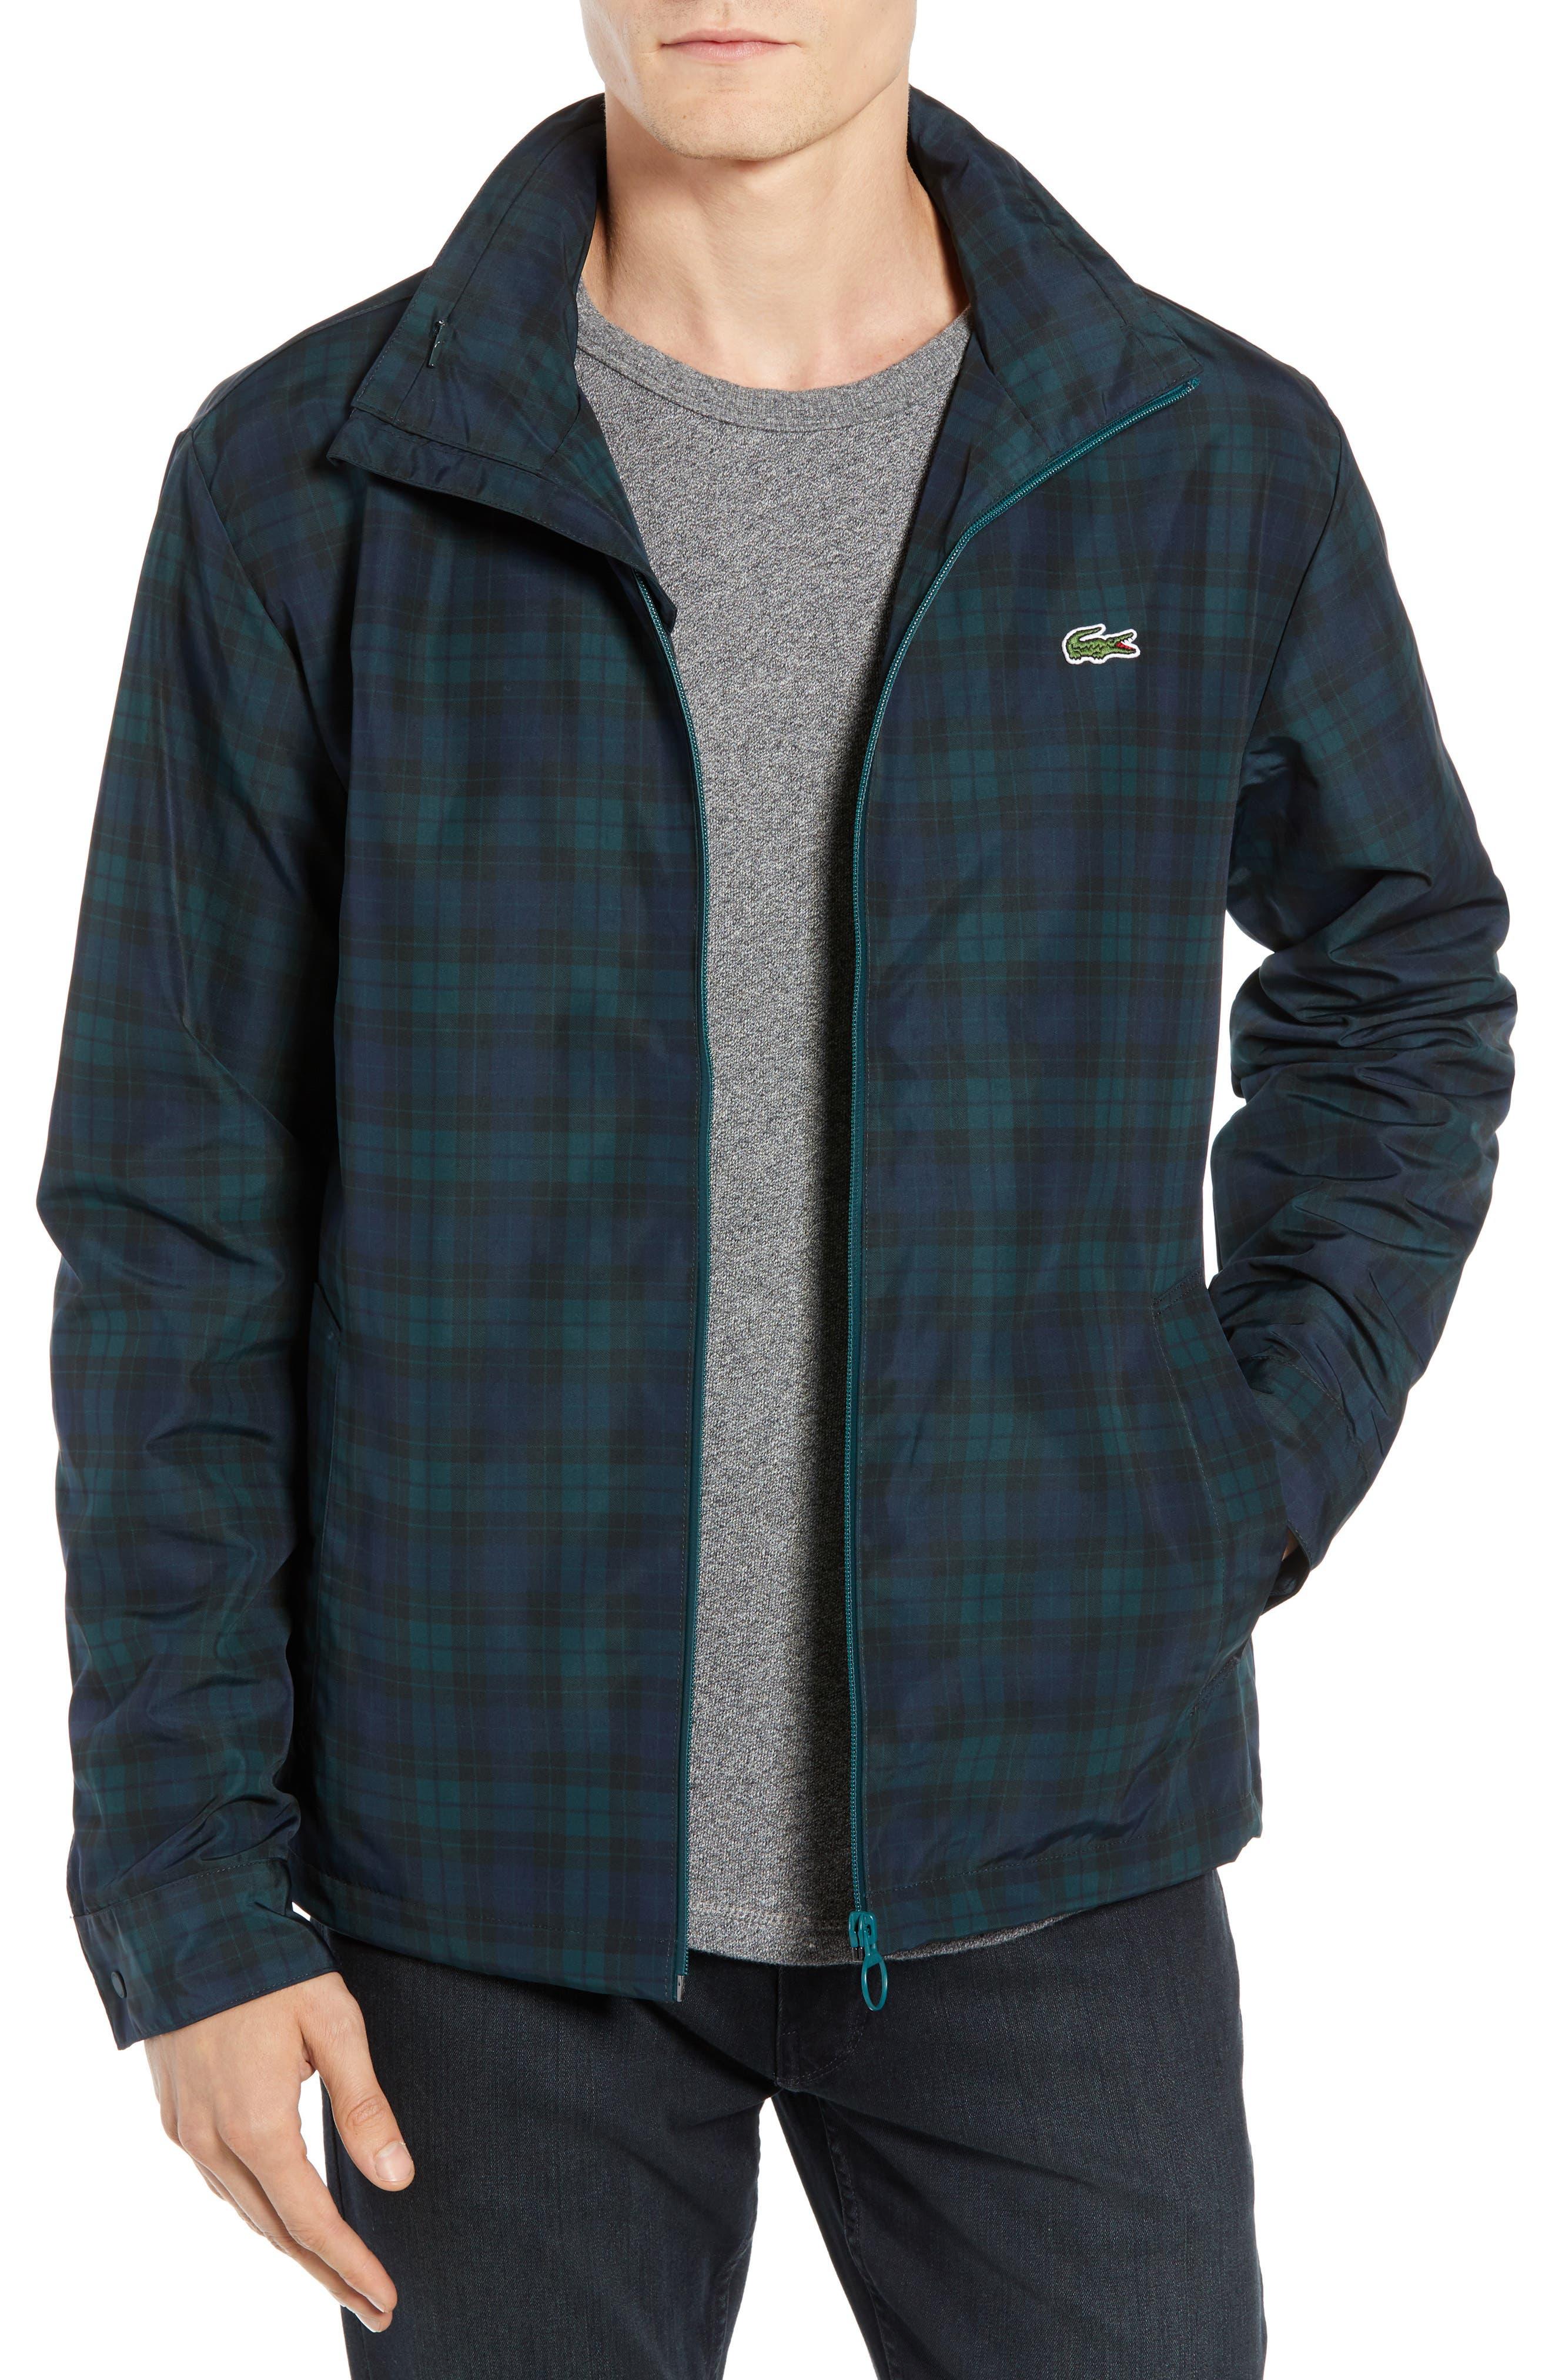 Regular Fit Check Windbreaker Jacket,                             Main thumbnail 1, color,                             NAVY BLUE/ SINOPLE BLACK